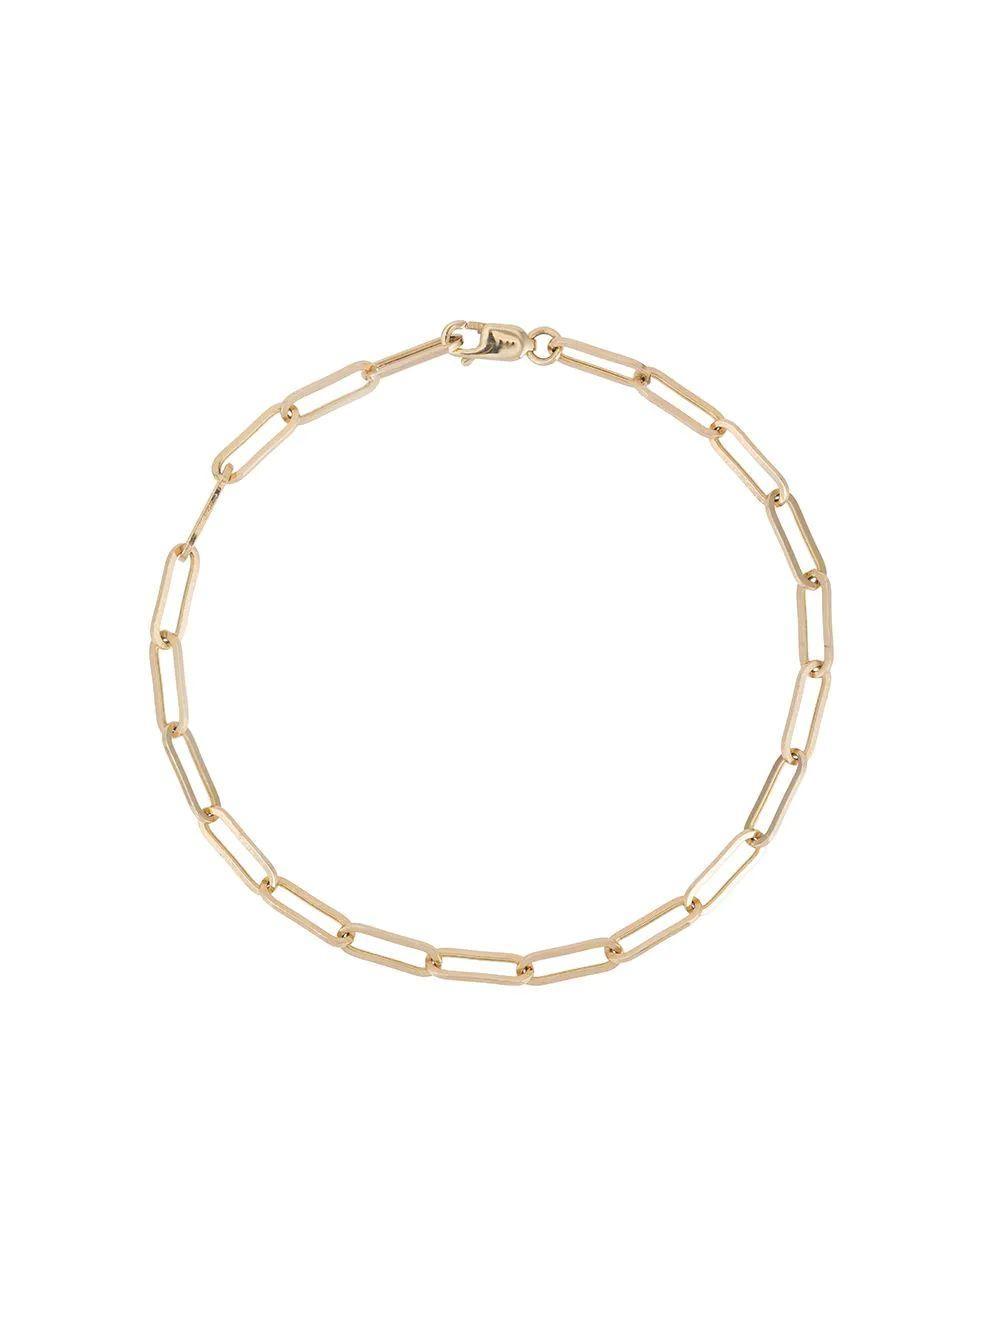 Paper Clip Bracelet Item # B461-2